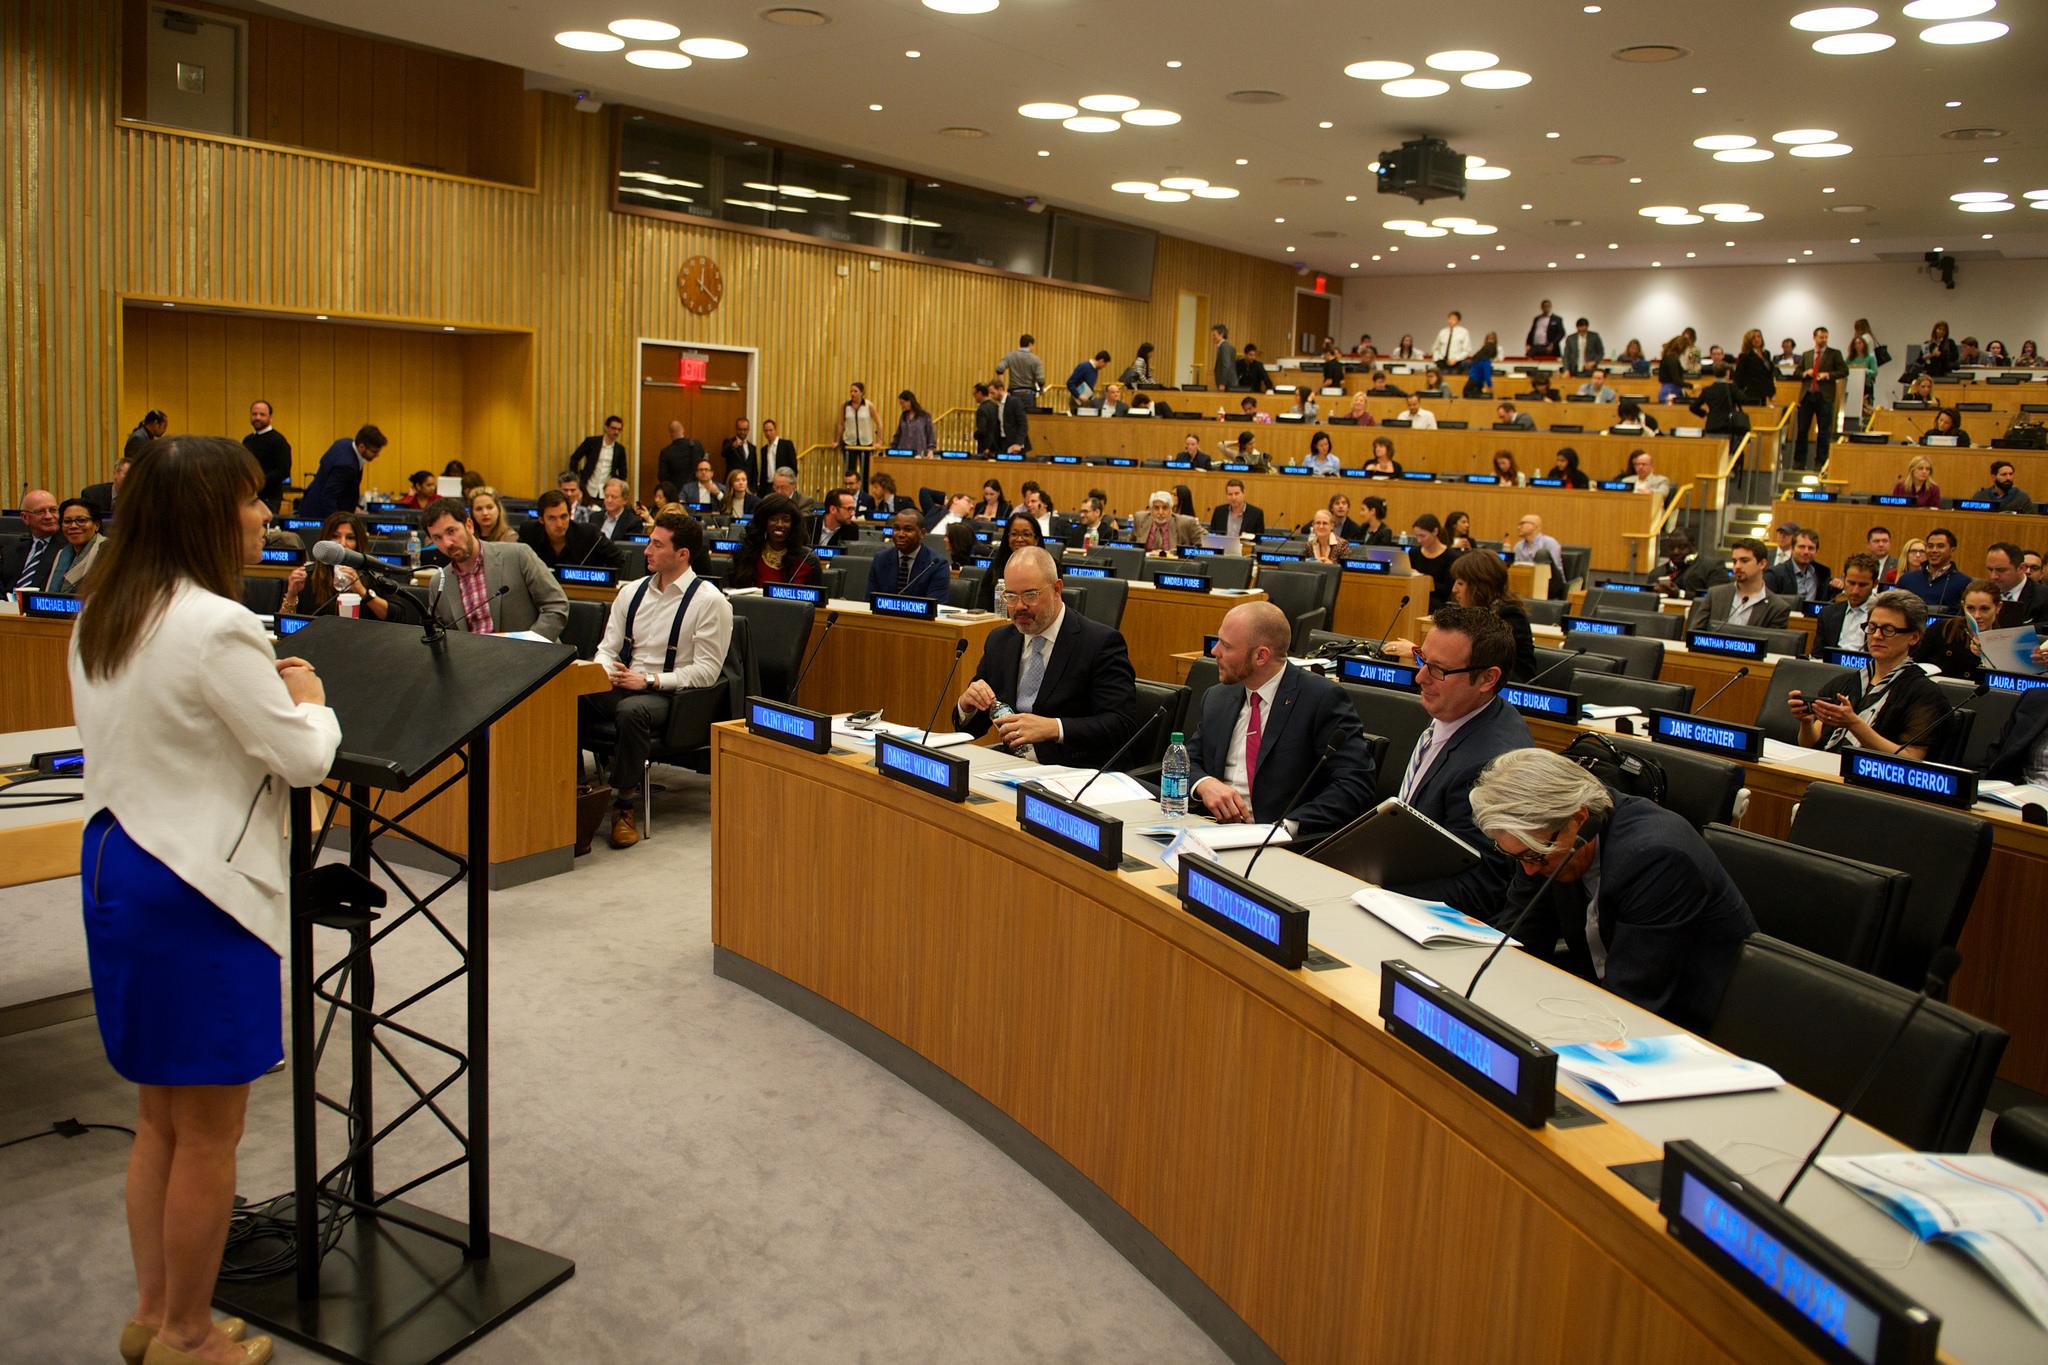 Panel UN